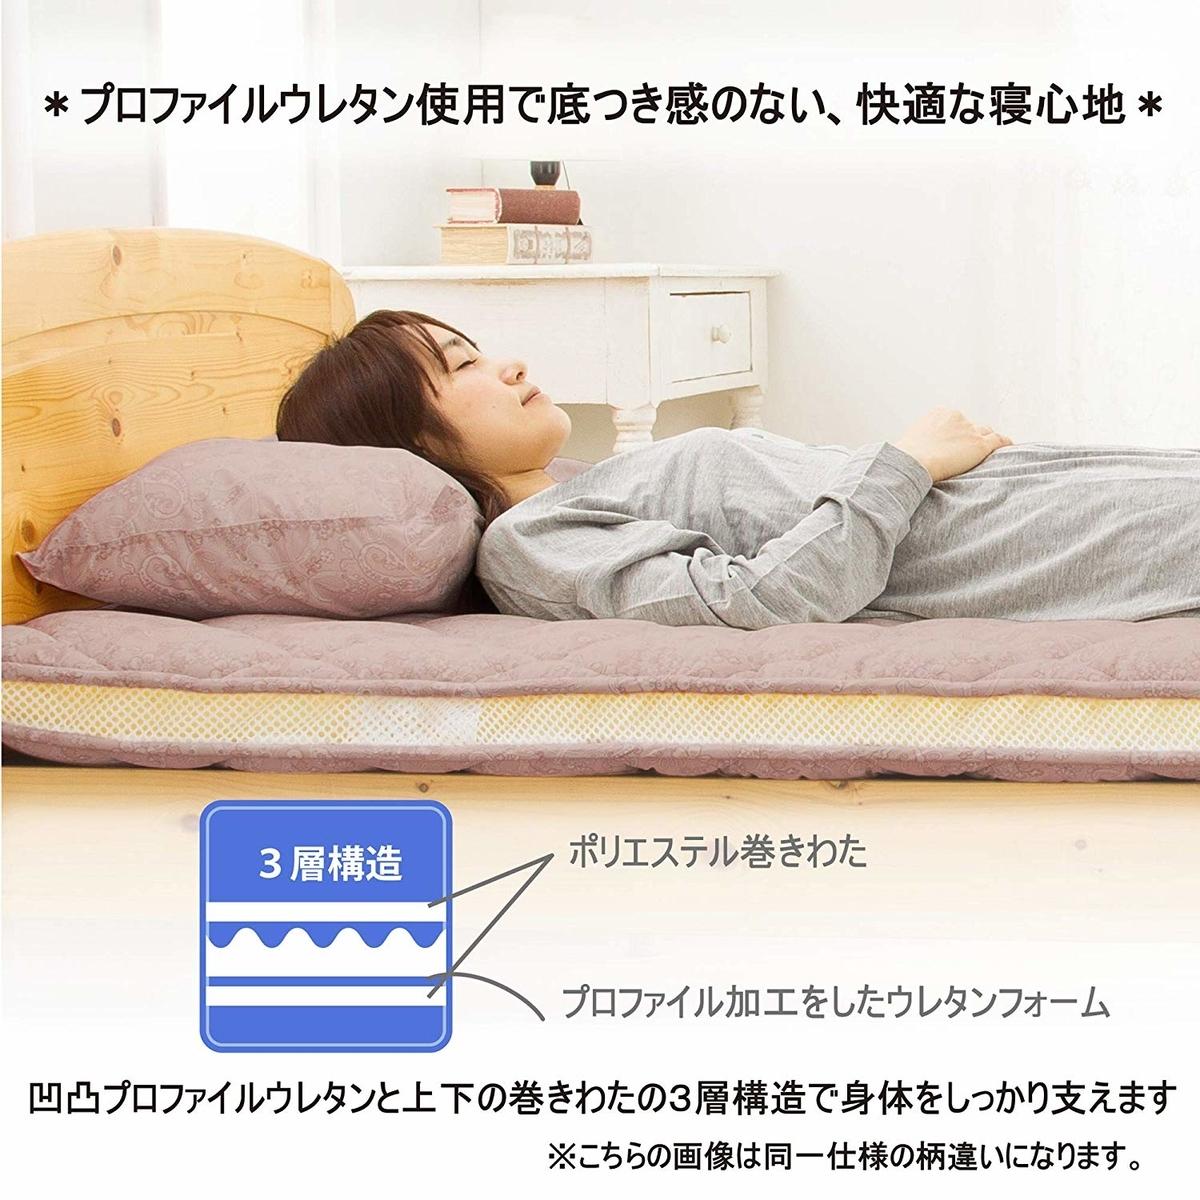 f:id:tsukarukatamade:20200104023209j:plain